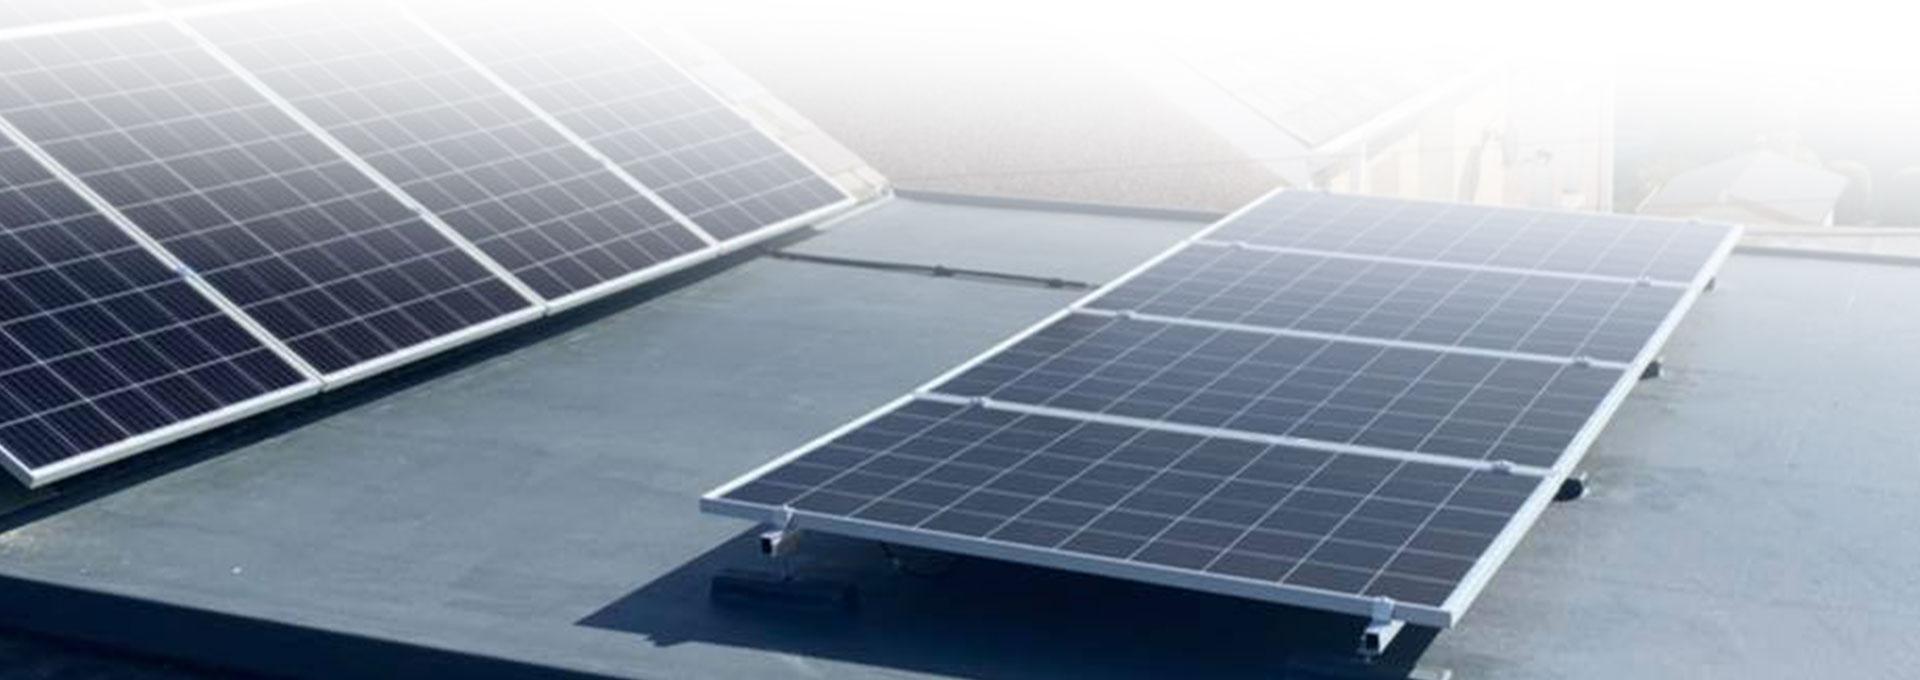 fibreglass roof with solar panels